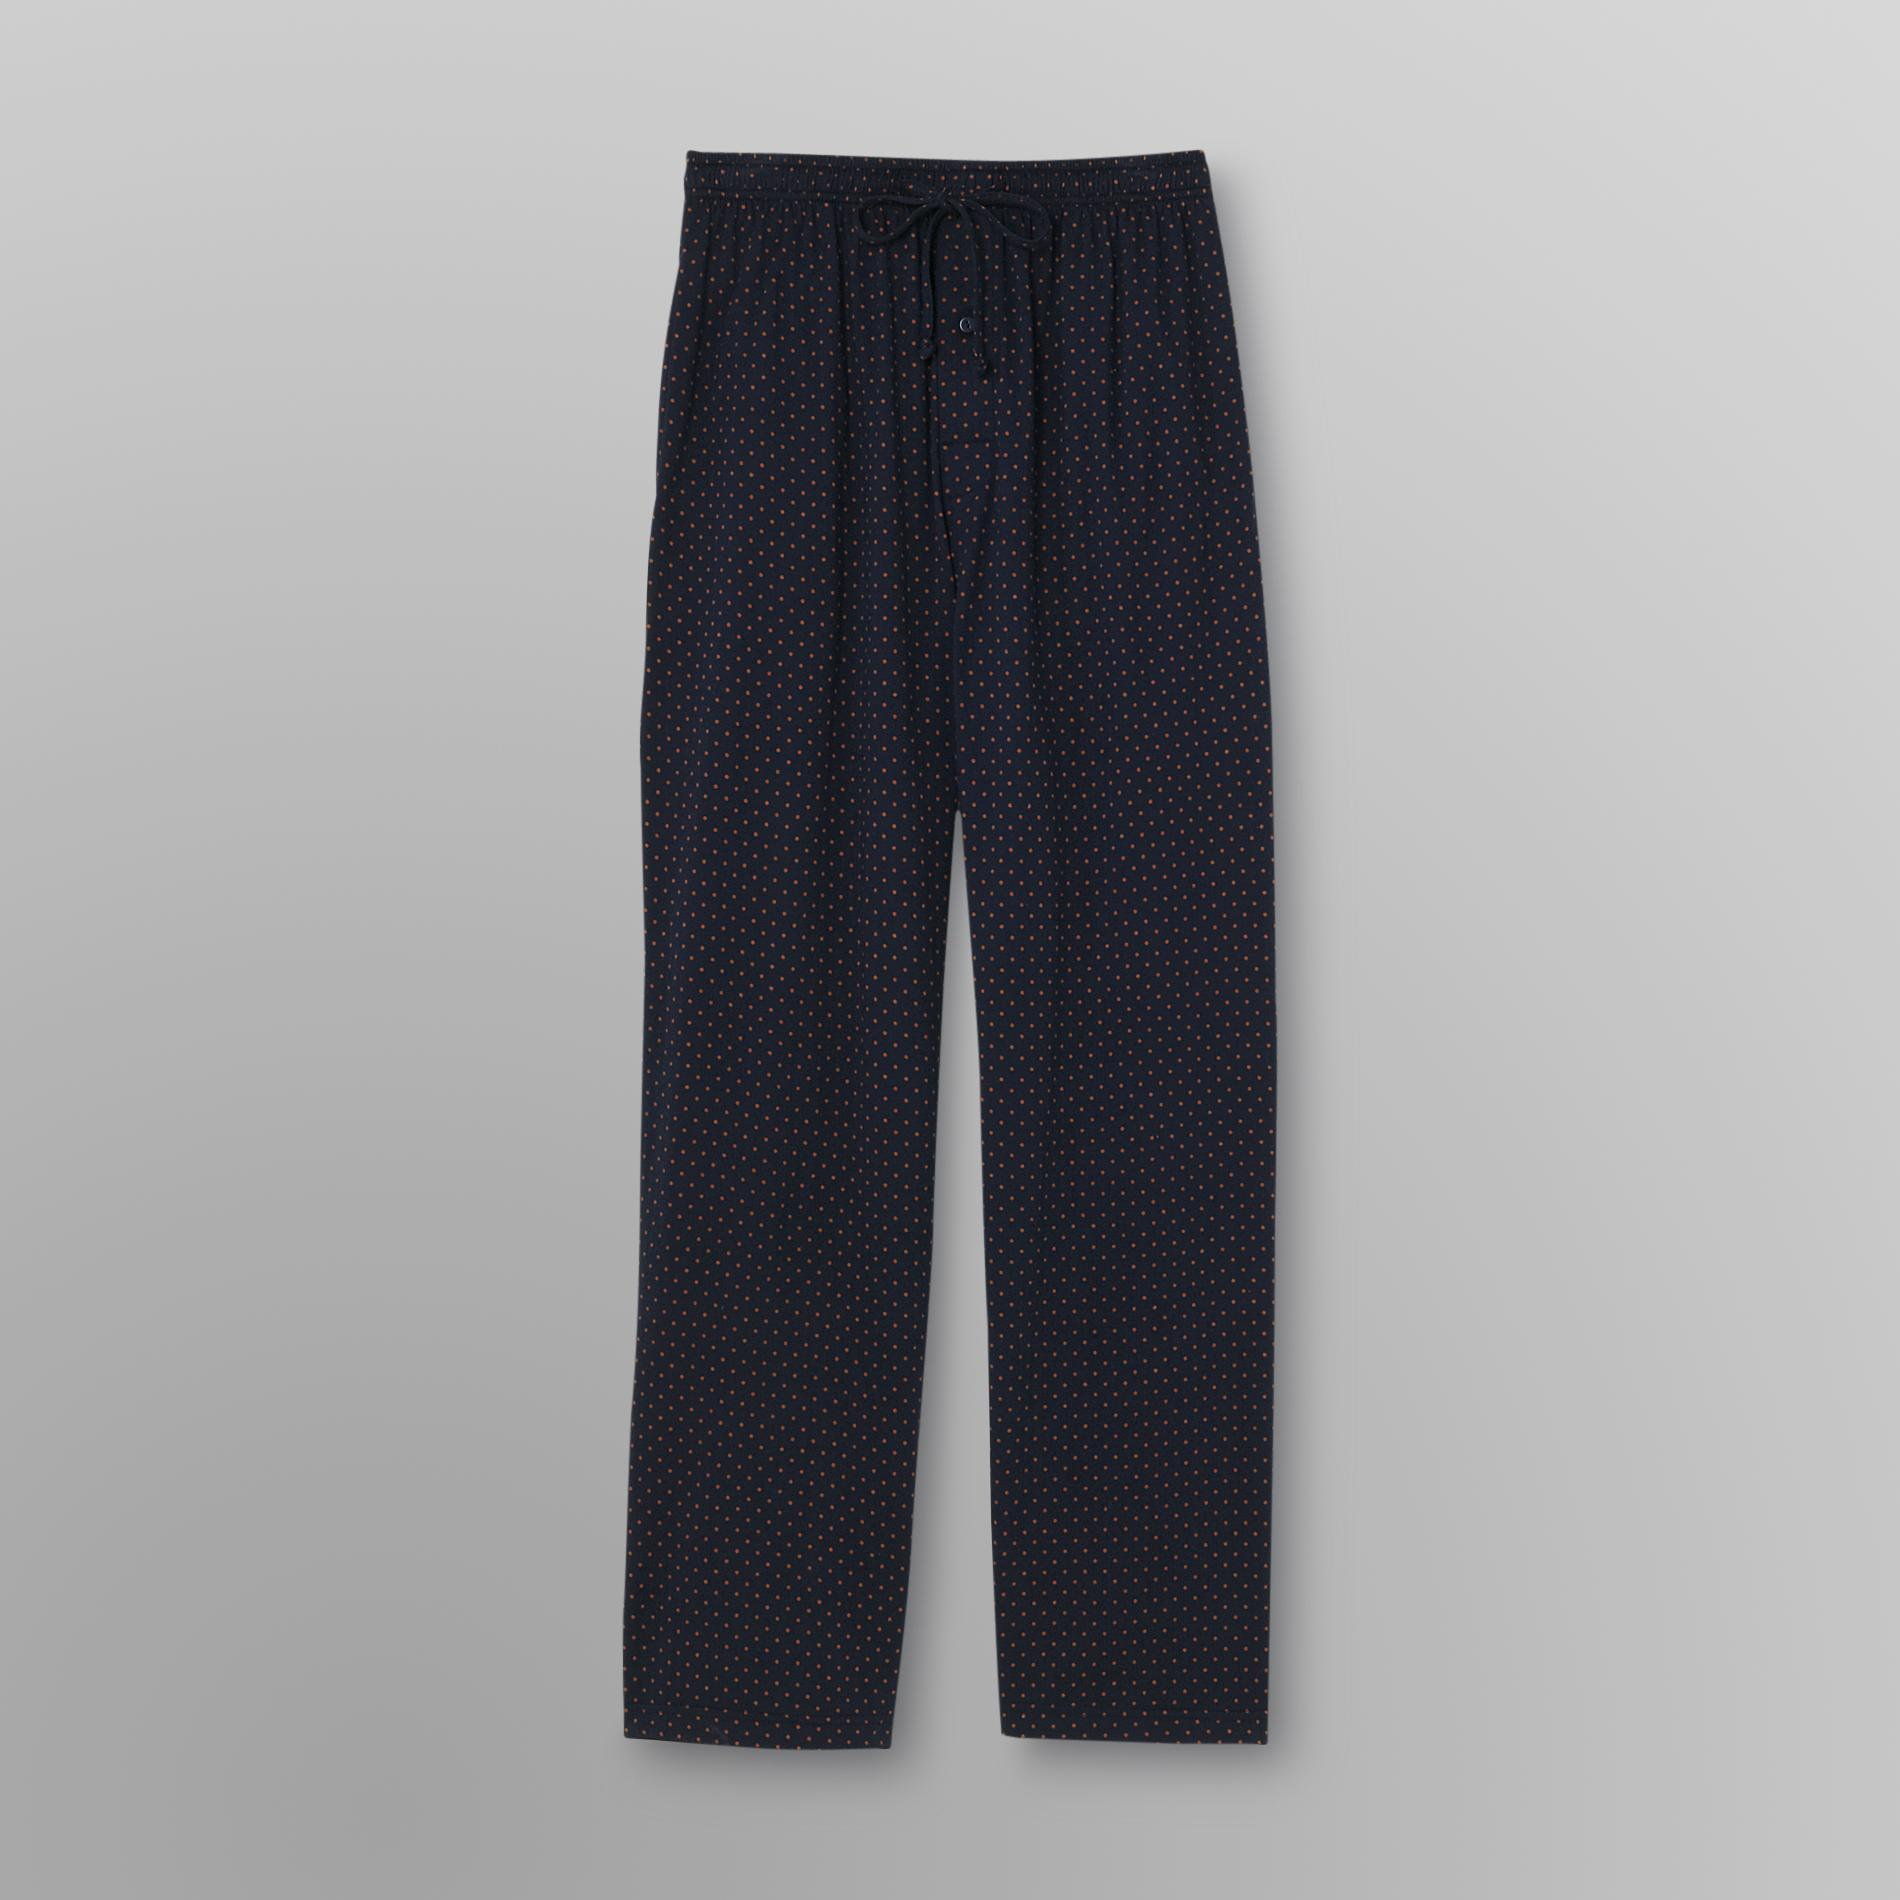 Covington Men's Big & Tall Pajama Pants - Dots